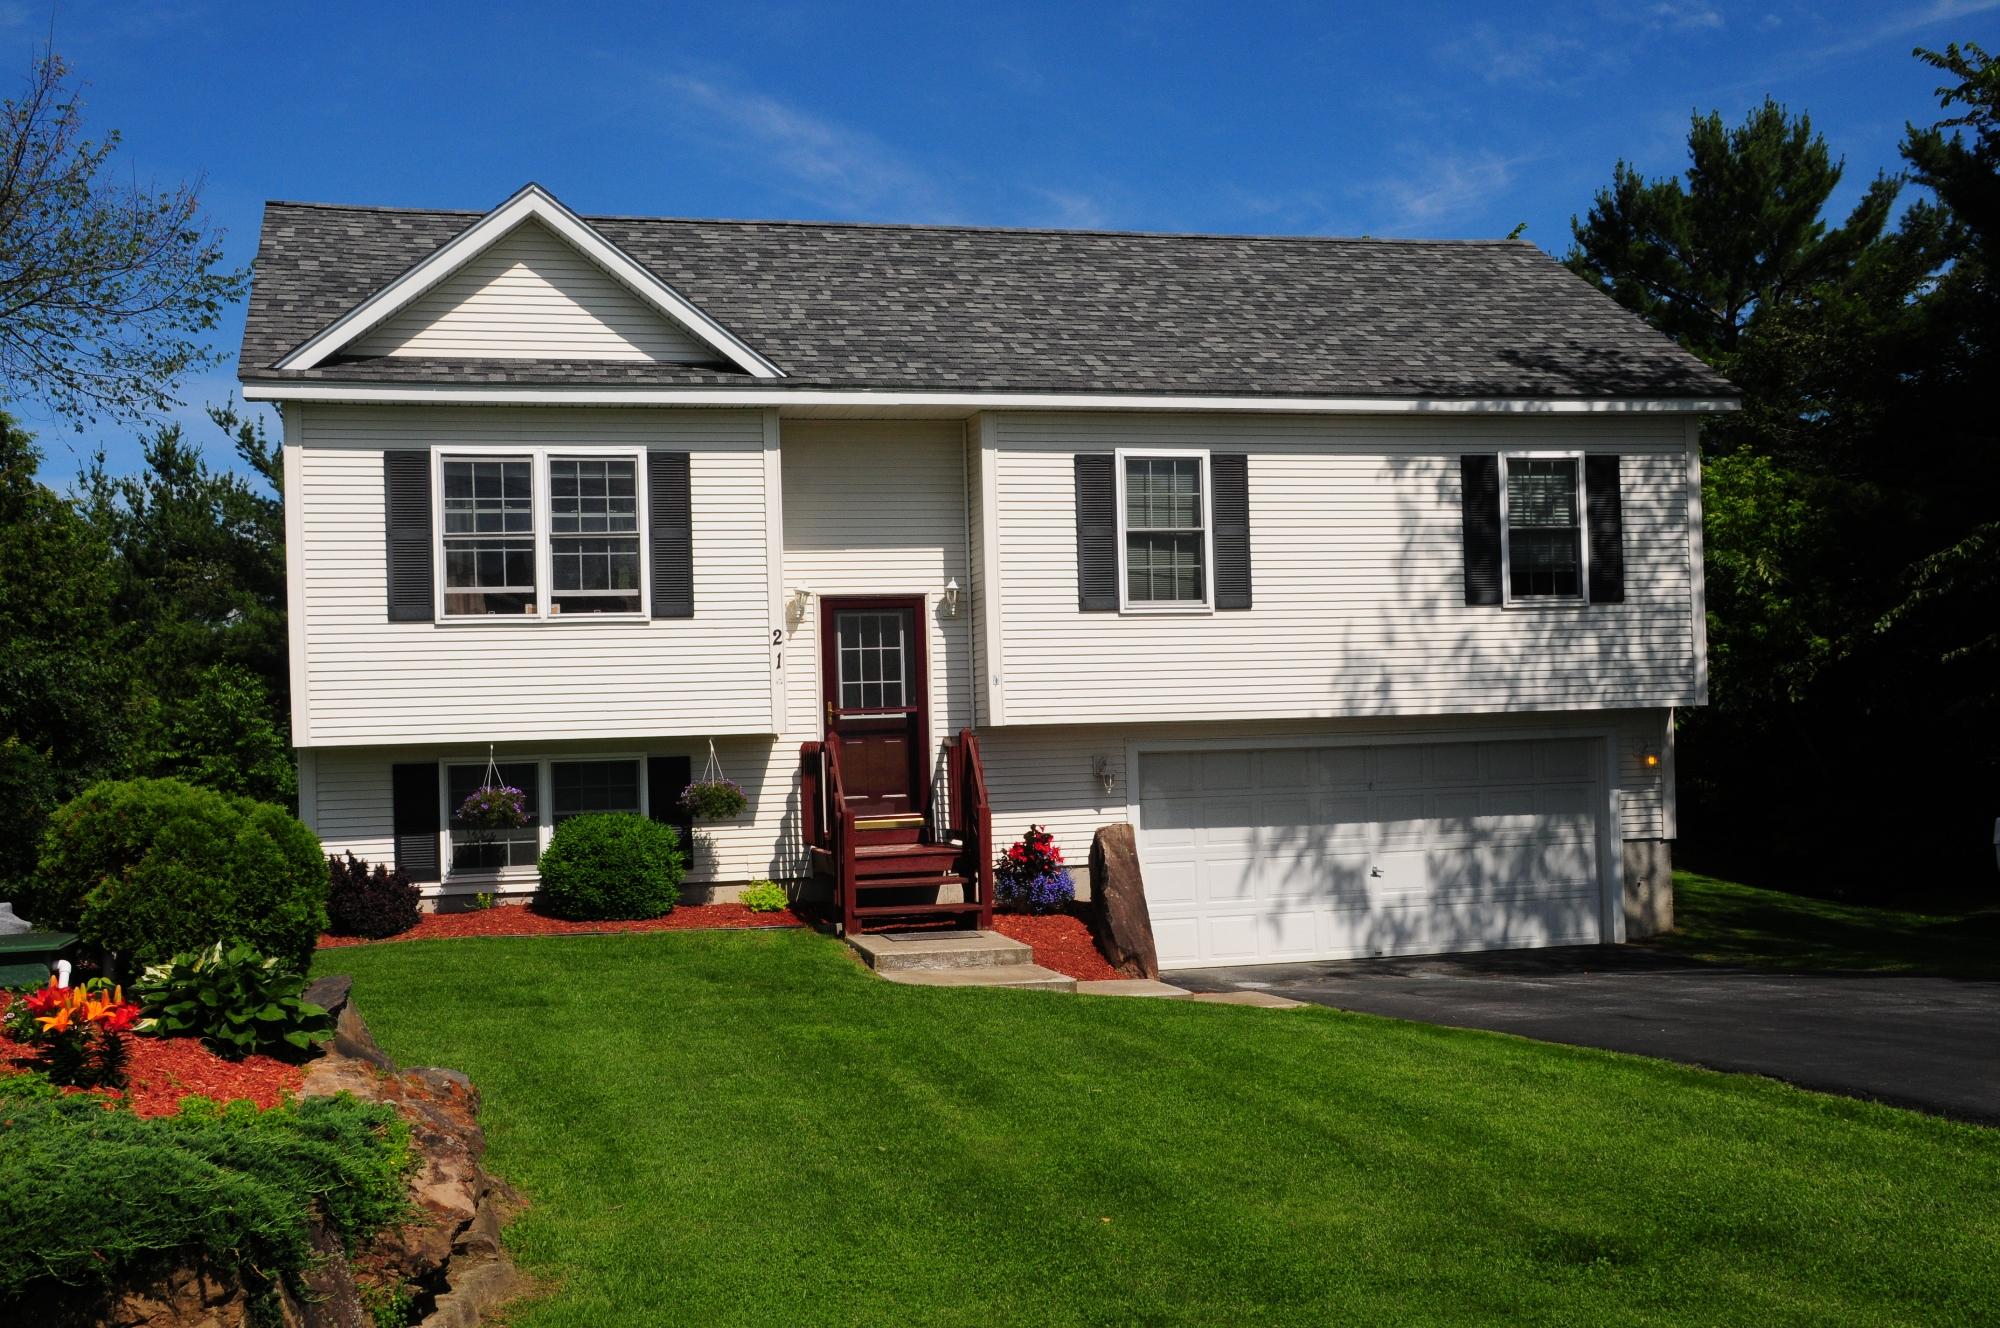 獨棟家庭住宅 為 出售 在 21 Glenridge Ln, Swanton Swanton, 佛蒙特州 05488 美國